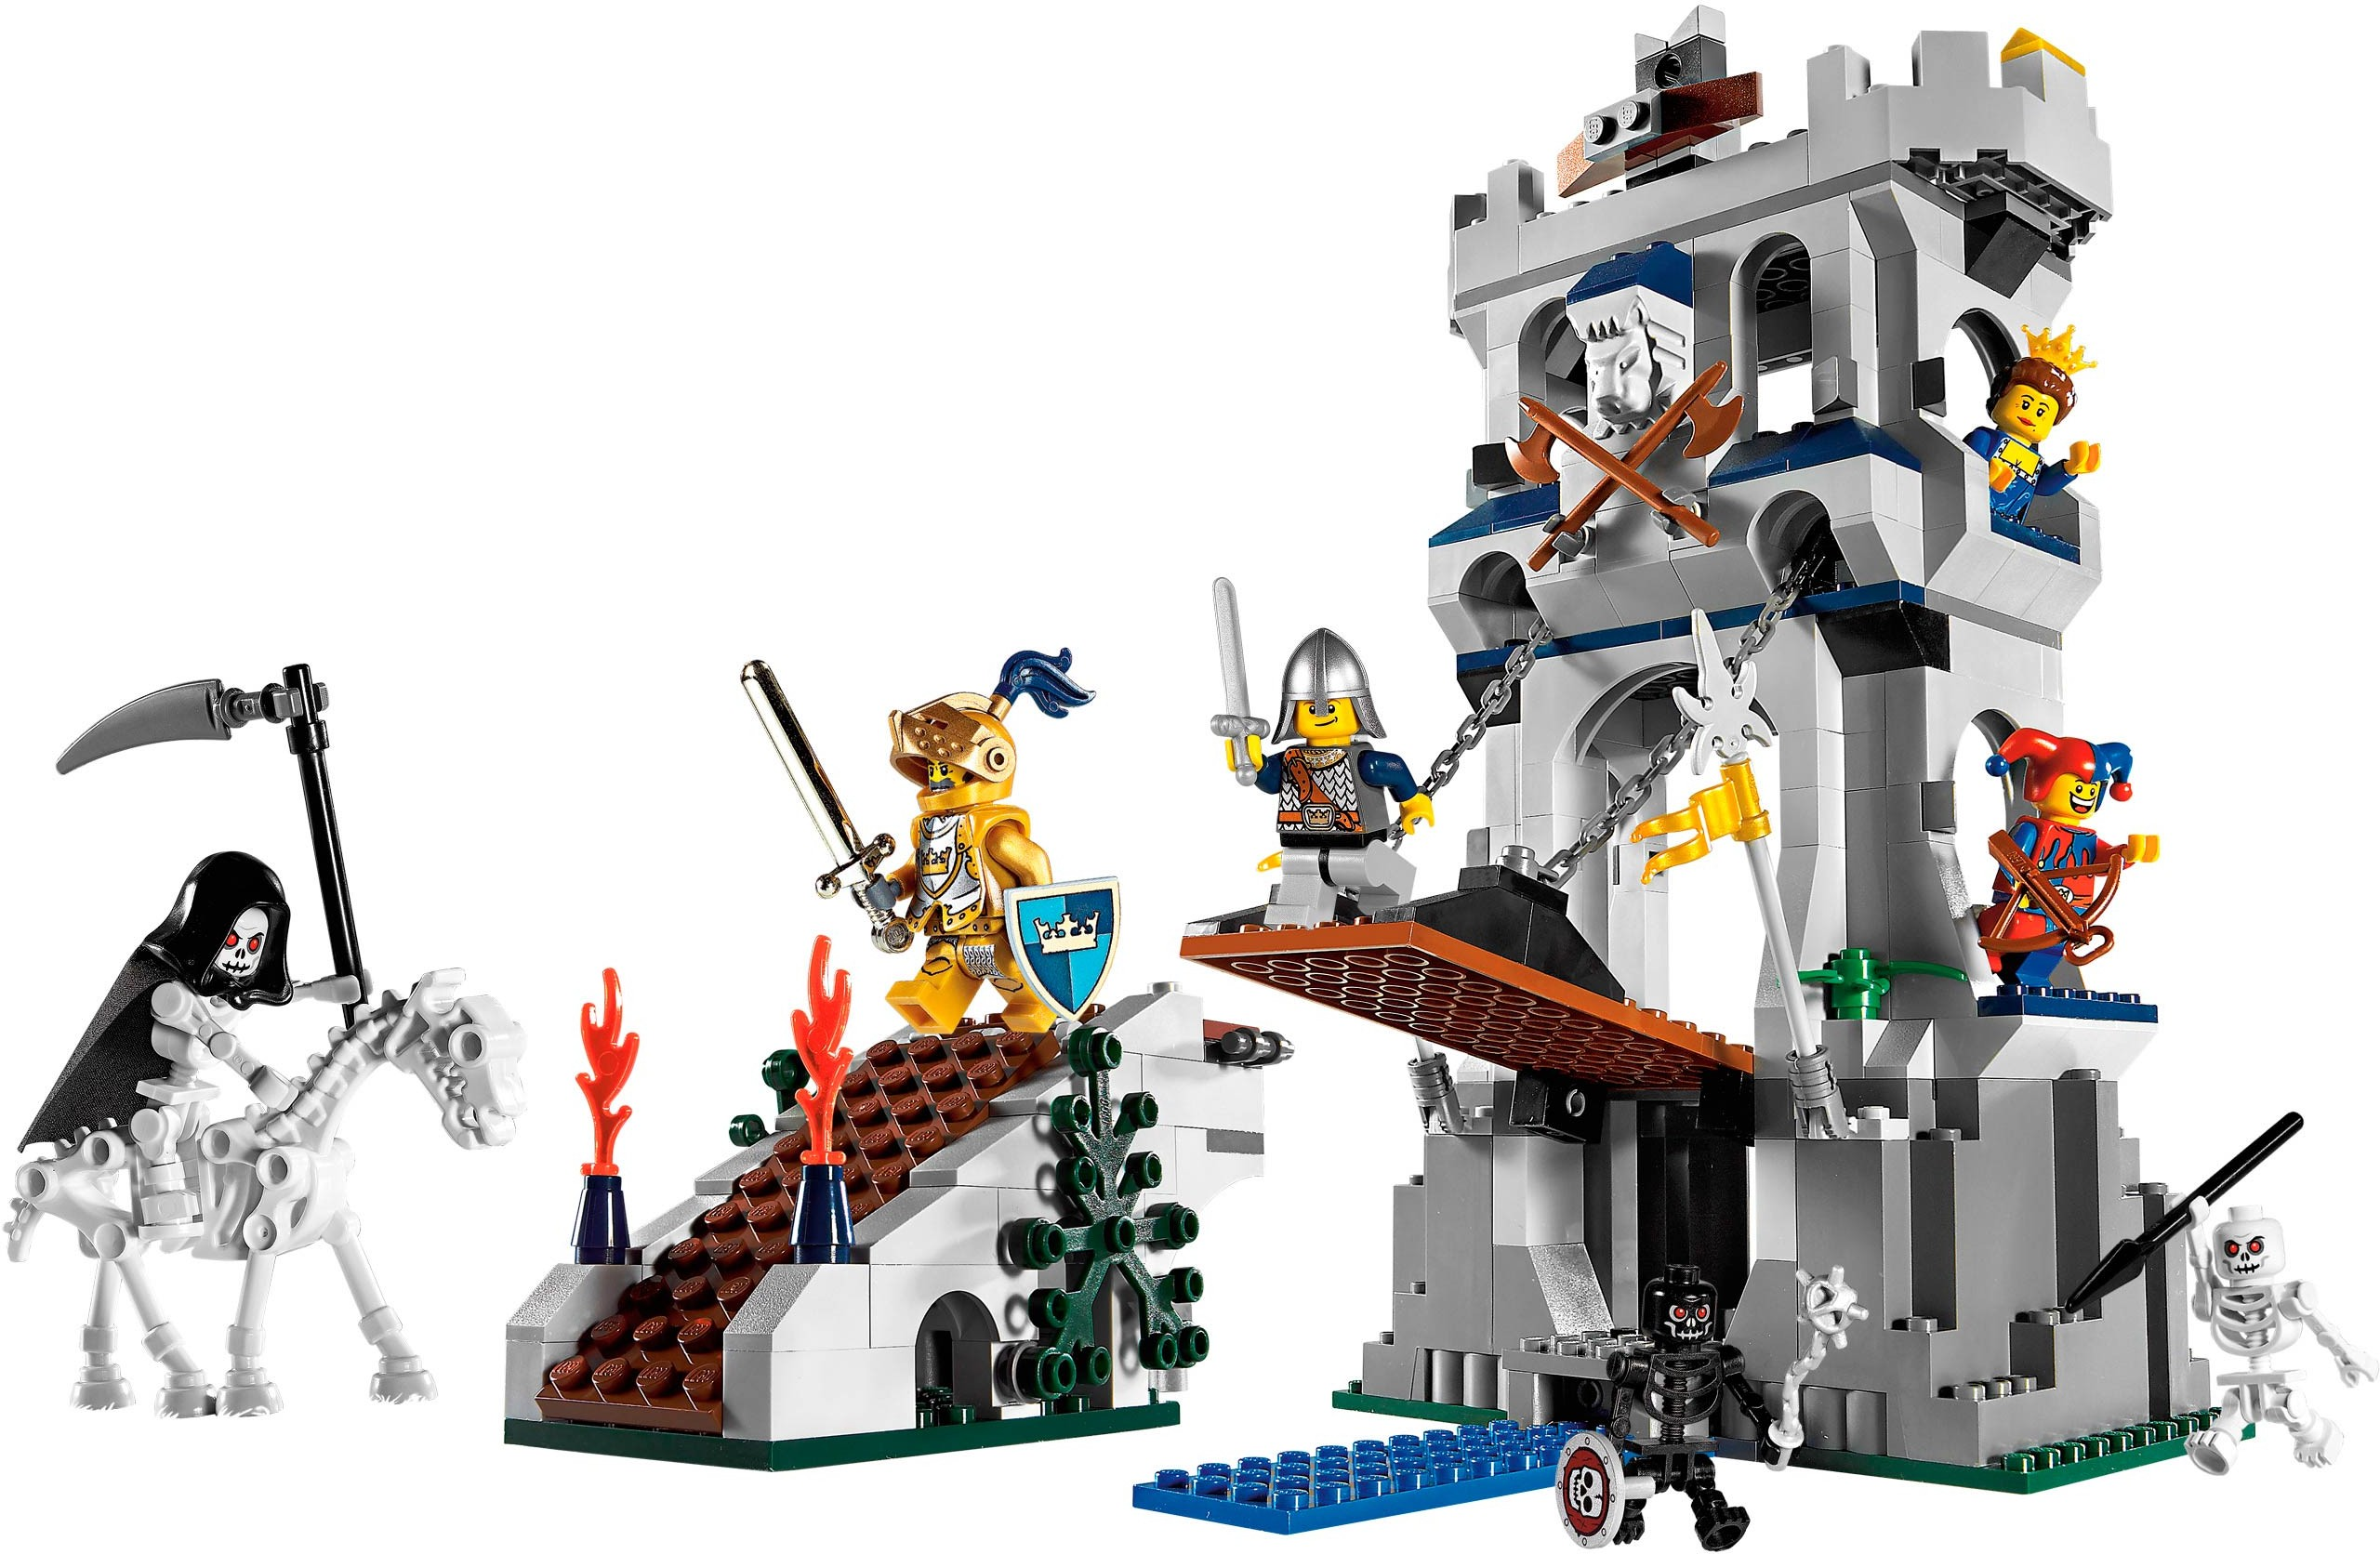 Castle 2009 Brickset Lego Set Guide And Database